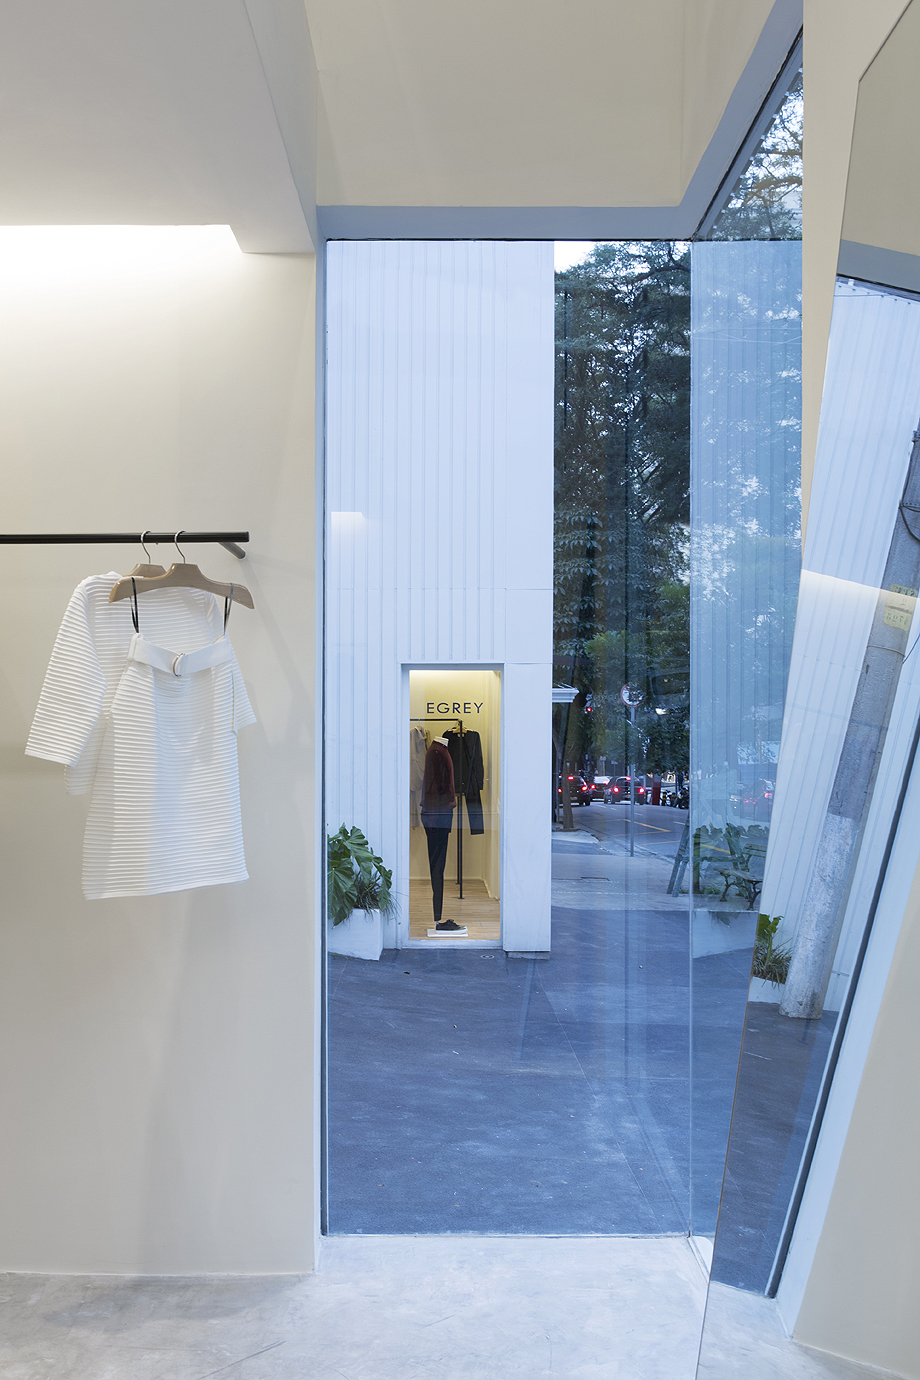 showroom egrey de mnma studio (14)